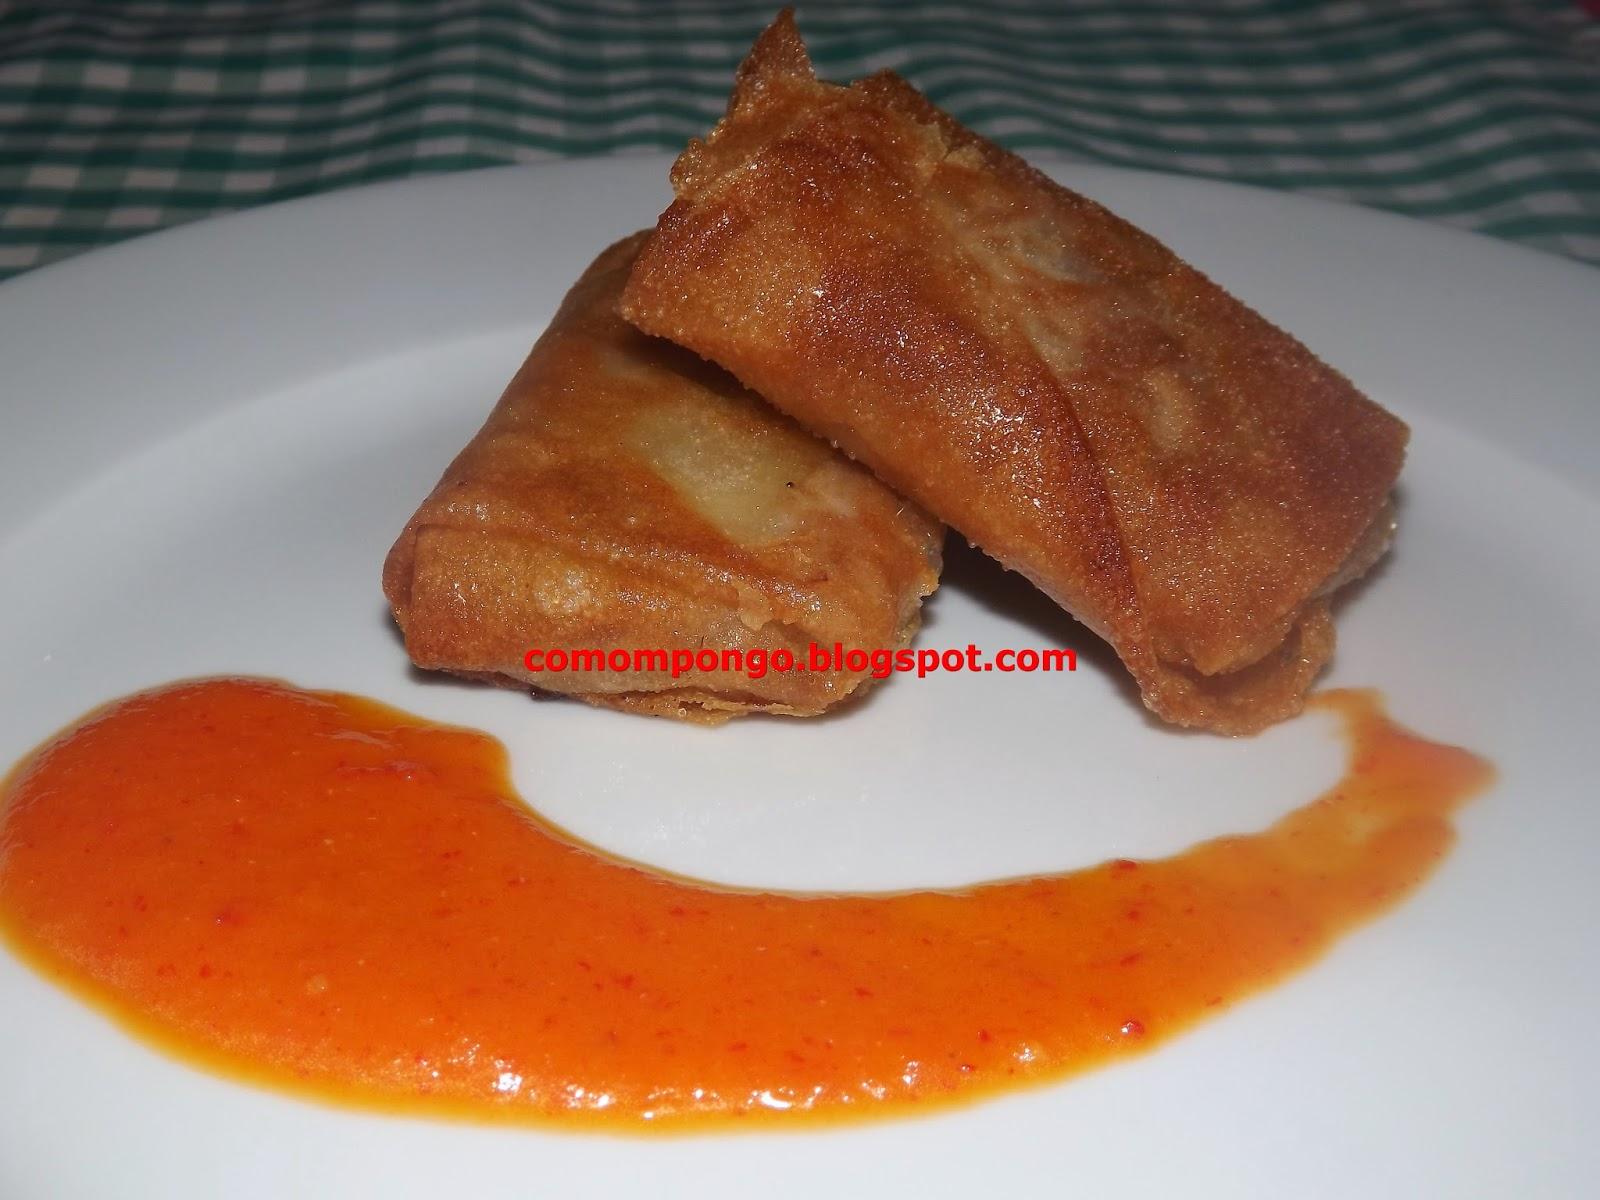 Rollitos de manitas de cordero con salsa vizcaina